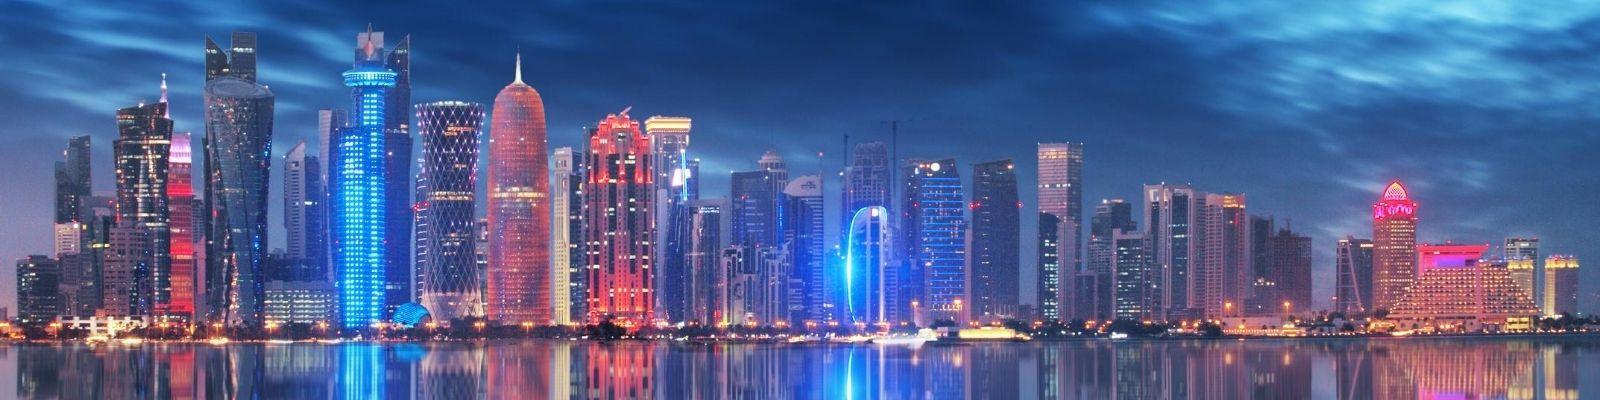 lex llc doha qatar about us banner image